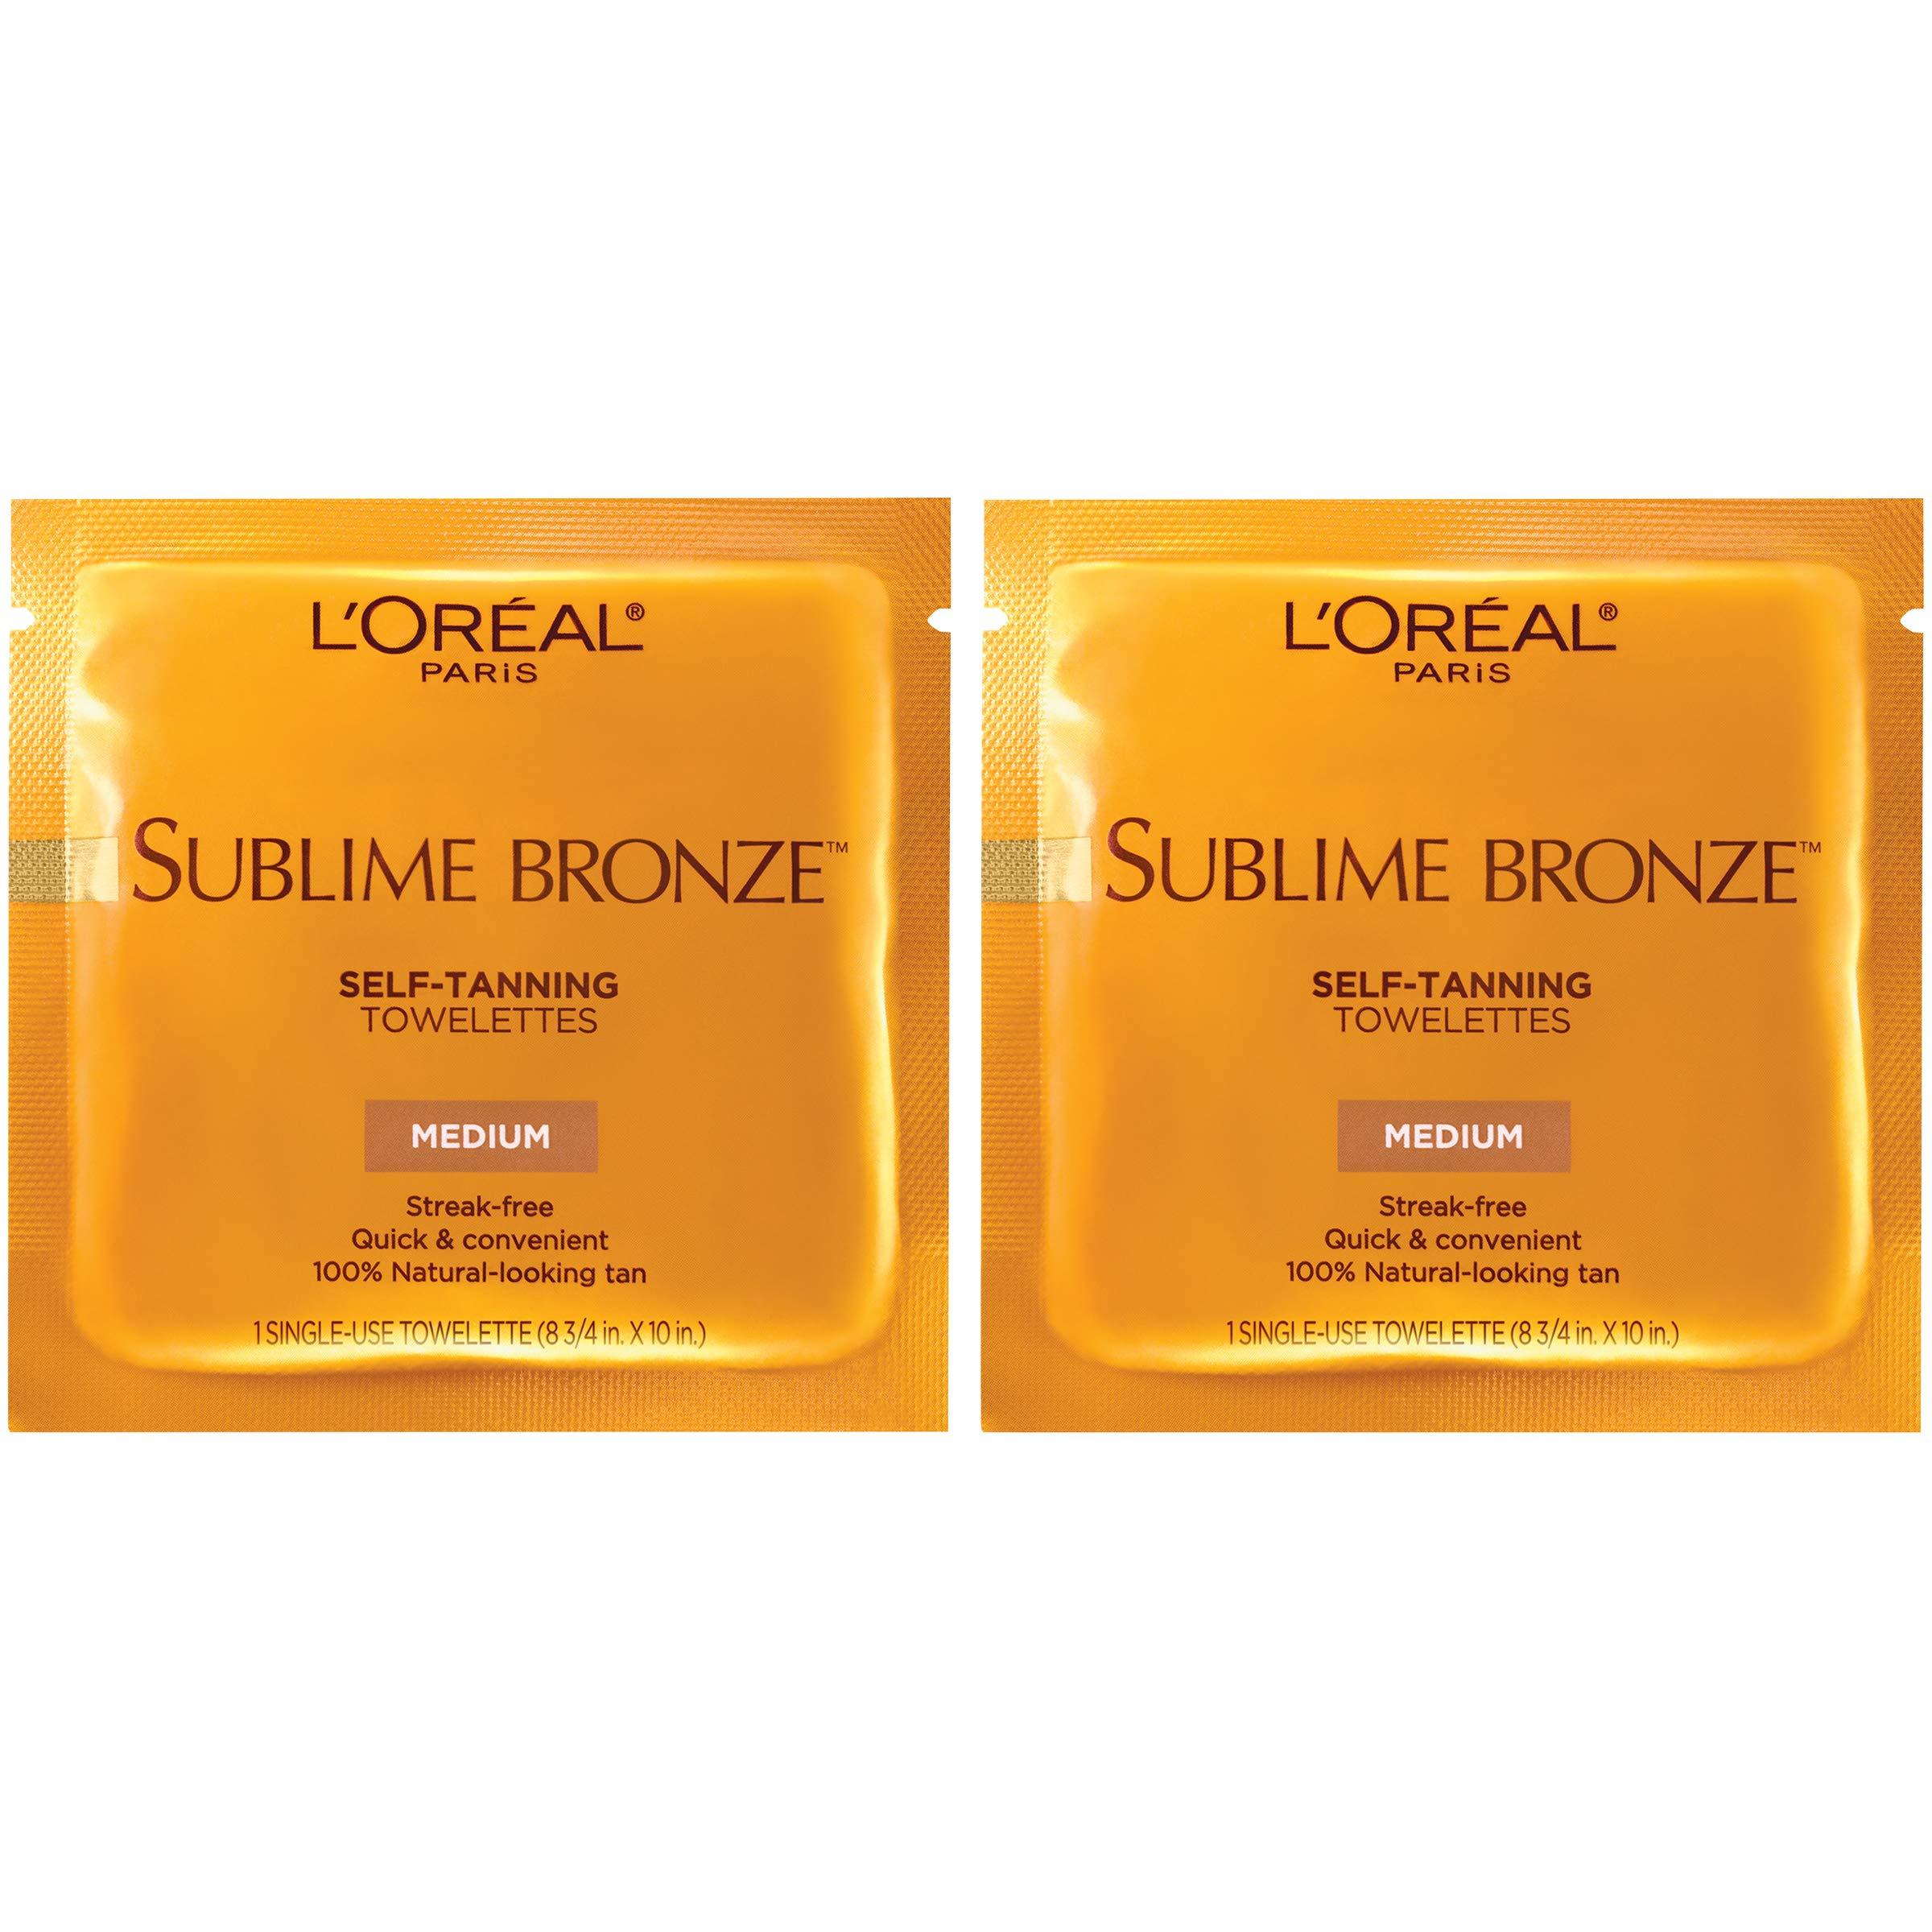 L'Oreal Paris Skin Care Sublime Bronze Self-Tanning Towelettes, 12 Count